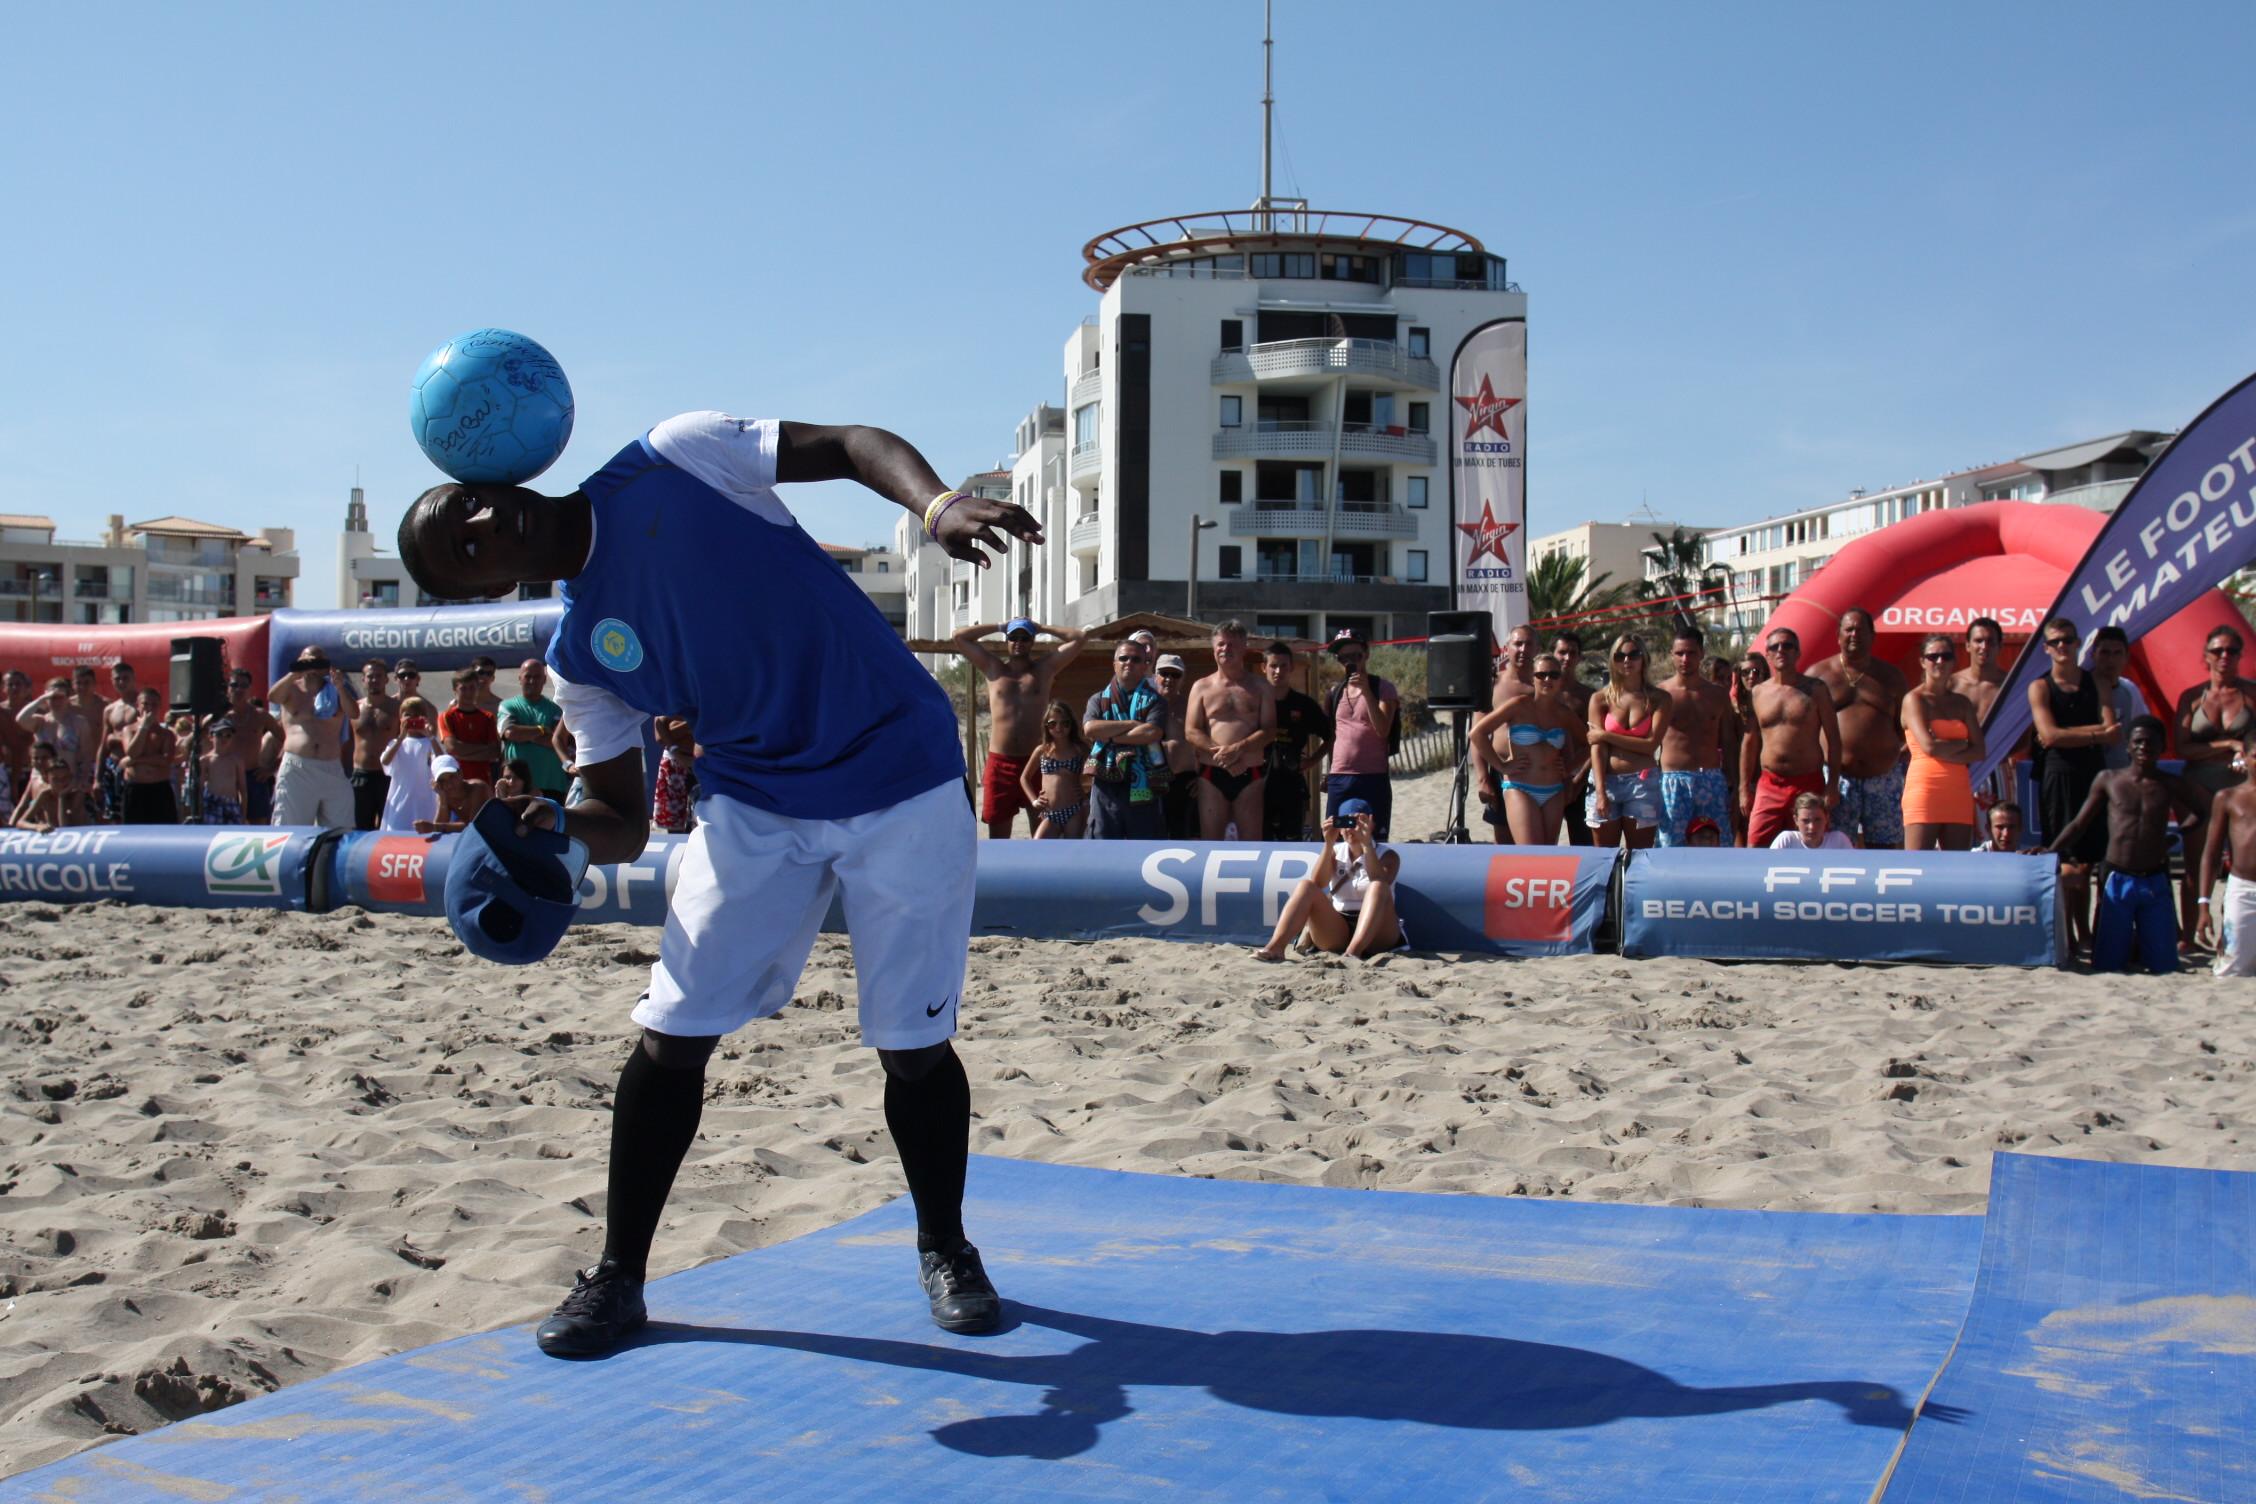 Boubou 001 - www.freestyleworldfootball.com.JPG